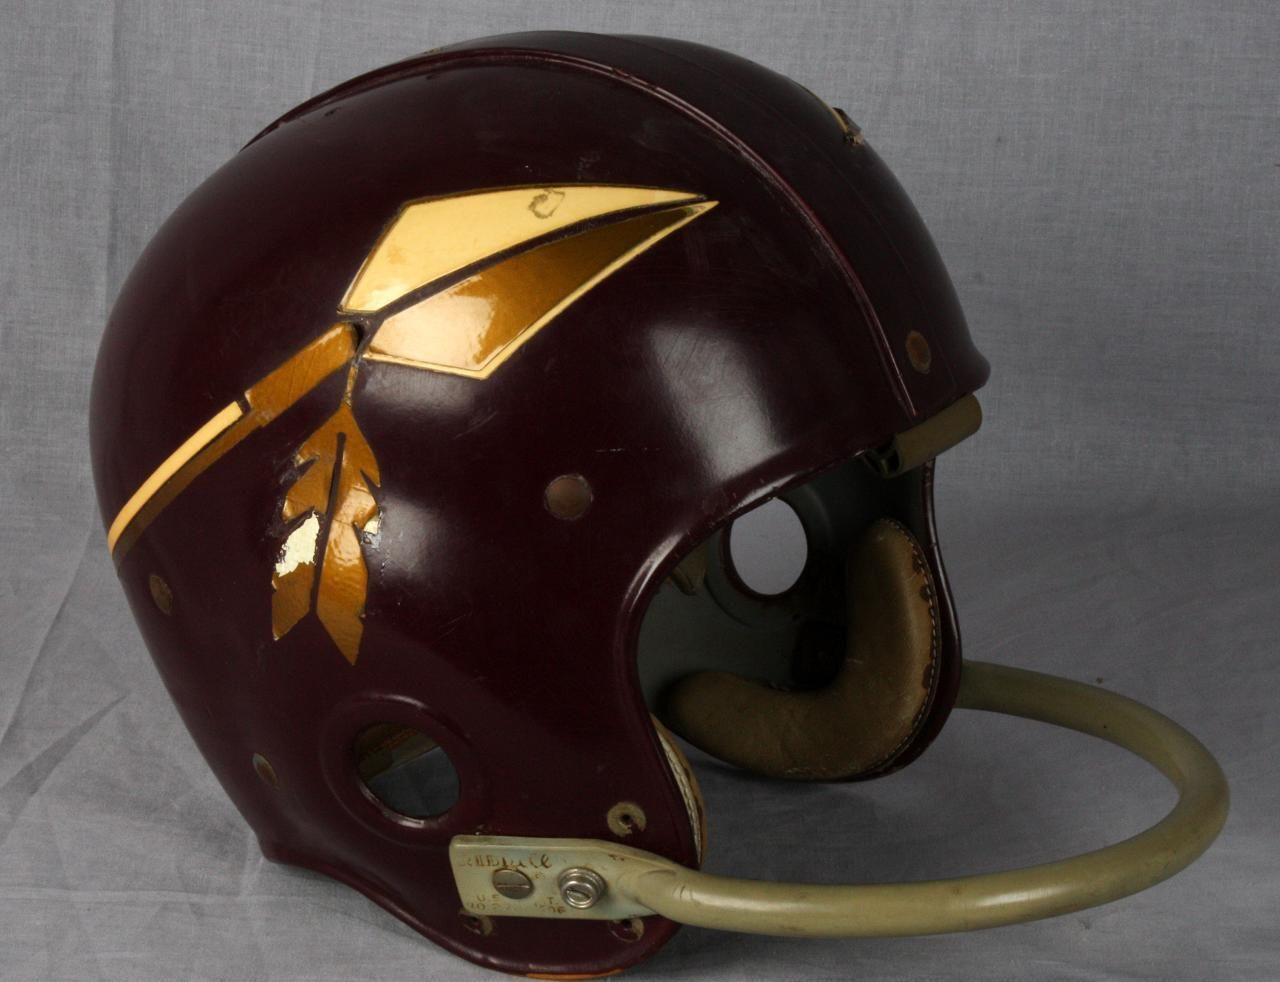 washington redskins old helmets Google Search Football